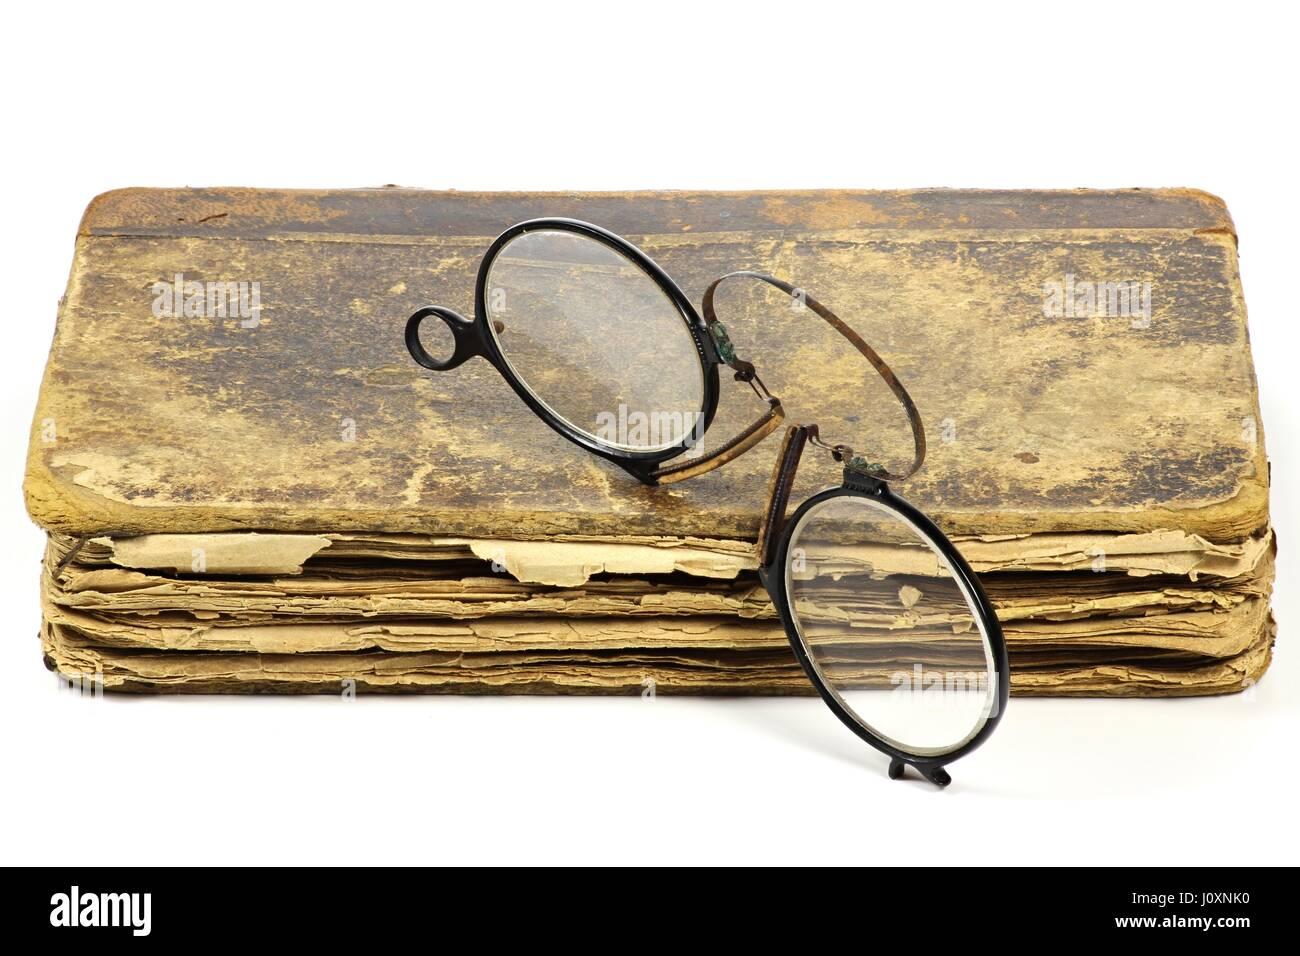 e1b0e461694 Pince Nez Glasses Stock Photos   Pince Nez Glasses Stock Images - Alamy